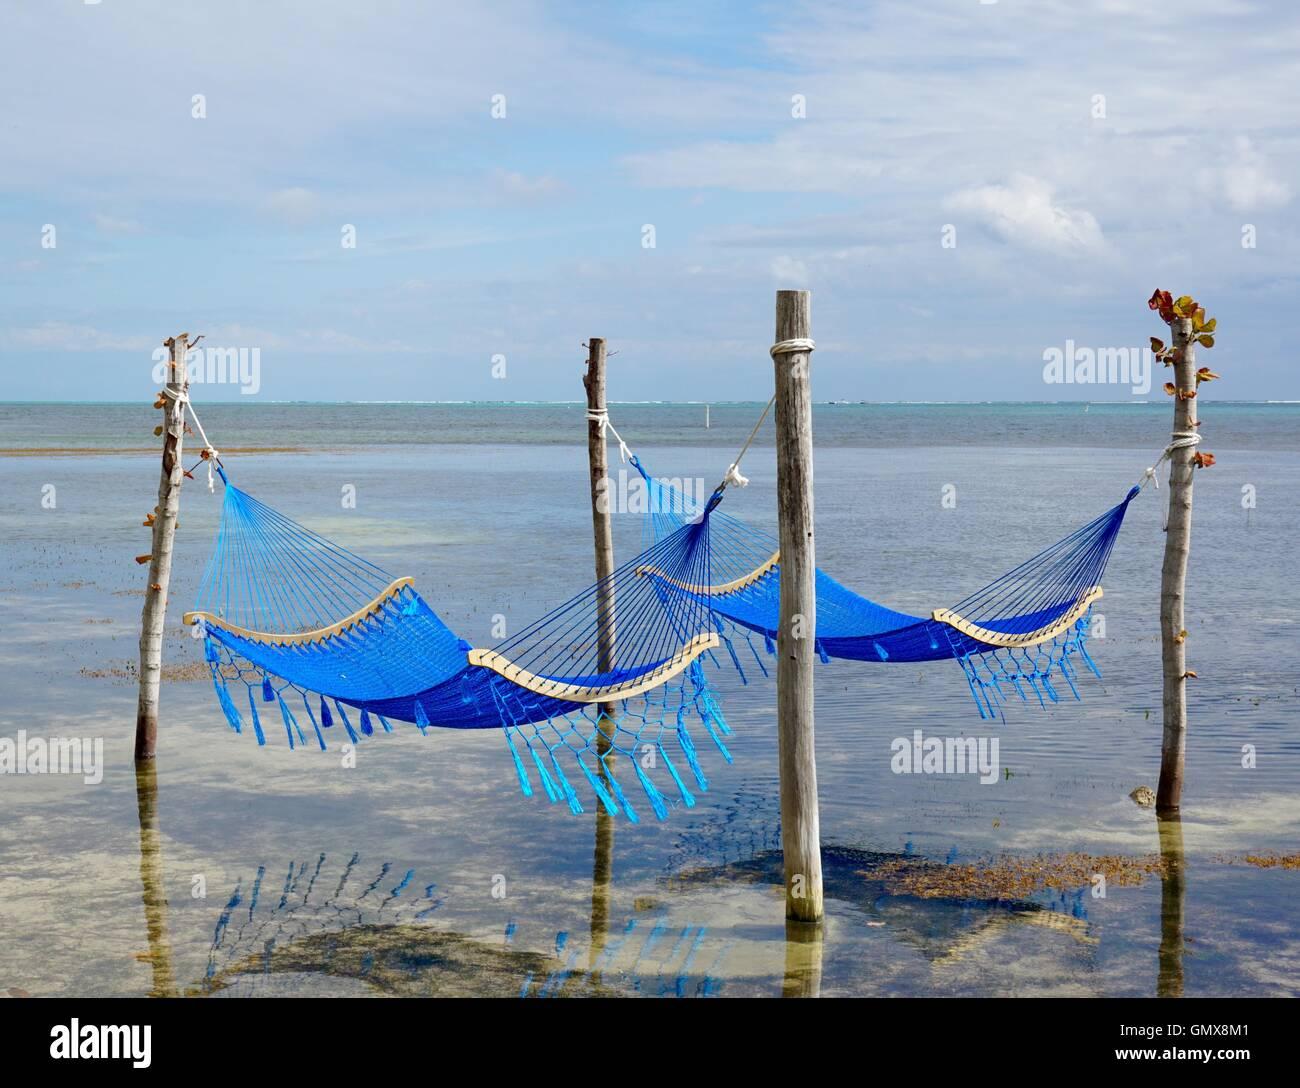 Hammocks in the ocean. Ambergris Caye, Belize. - Stock Image